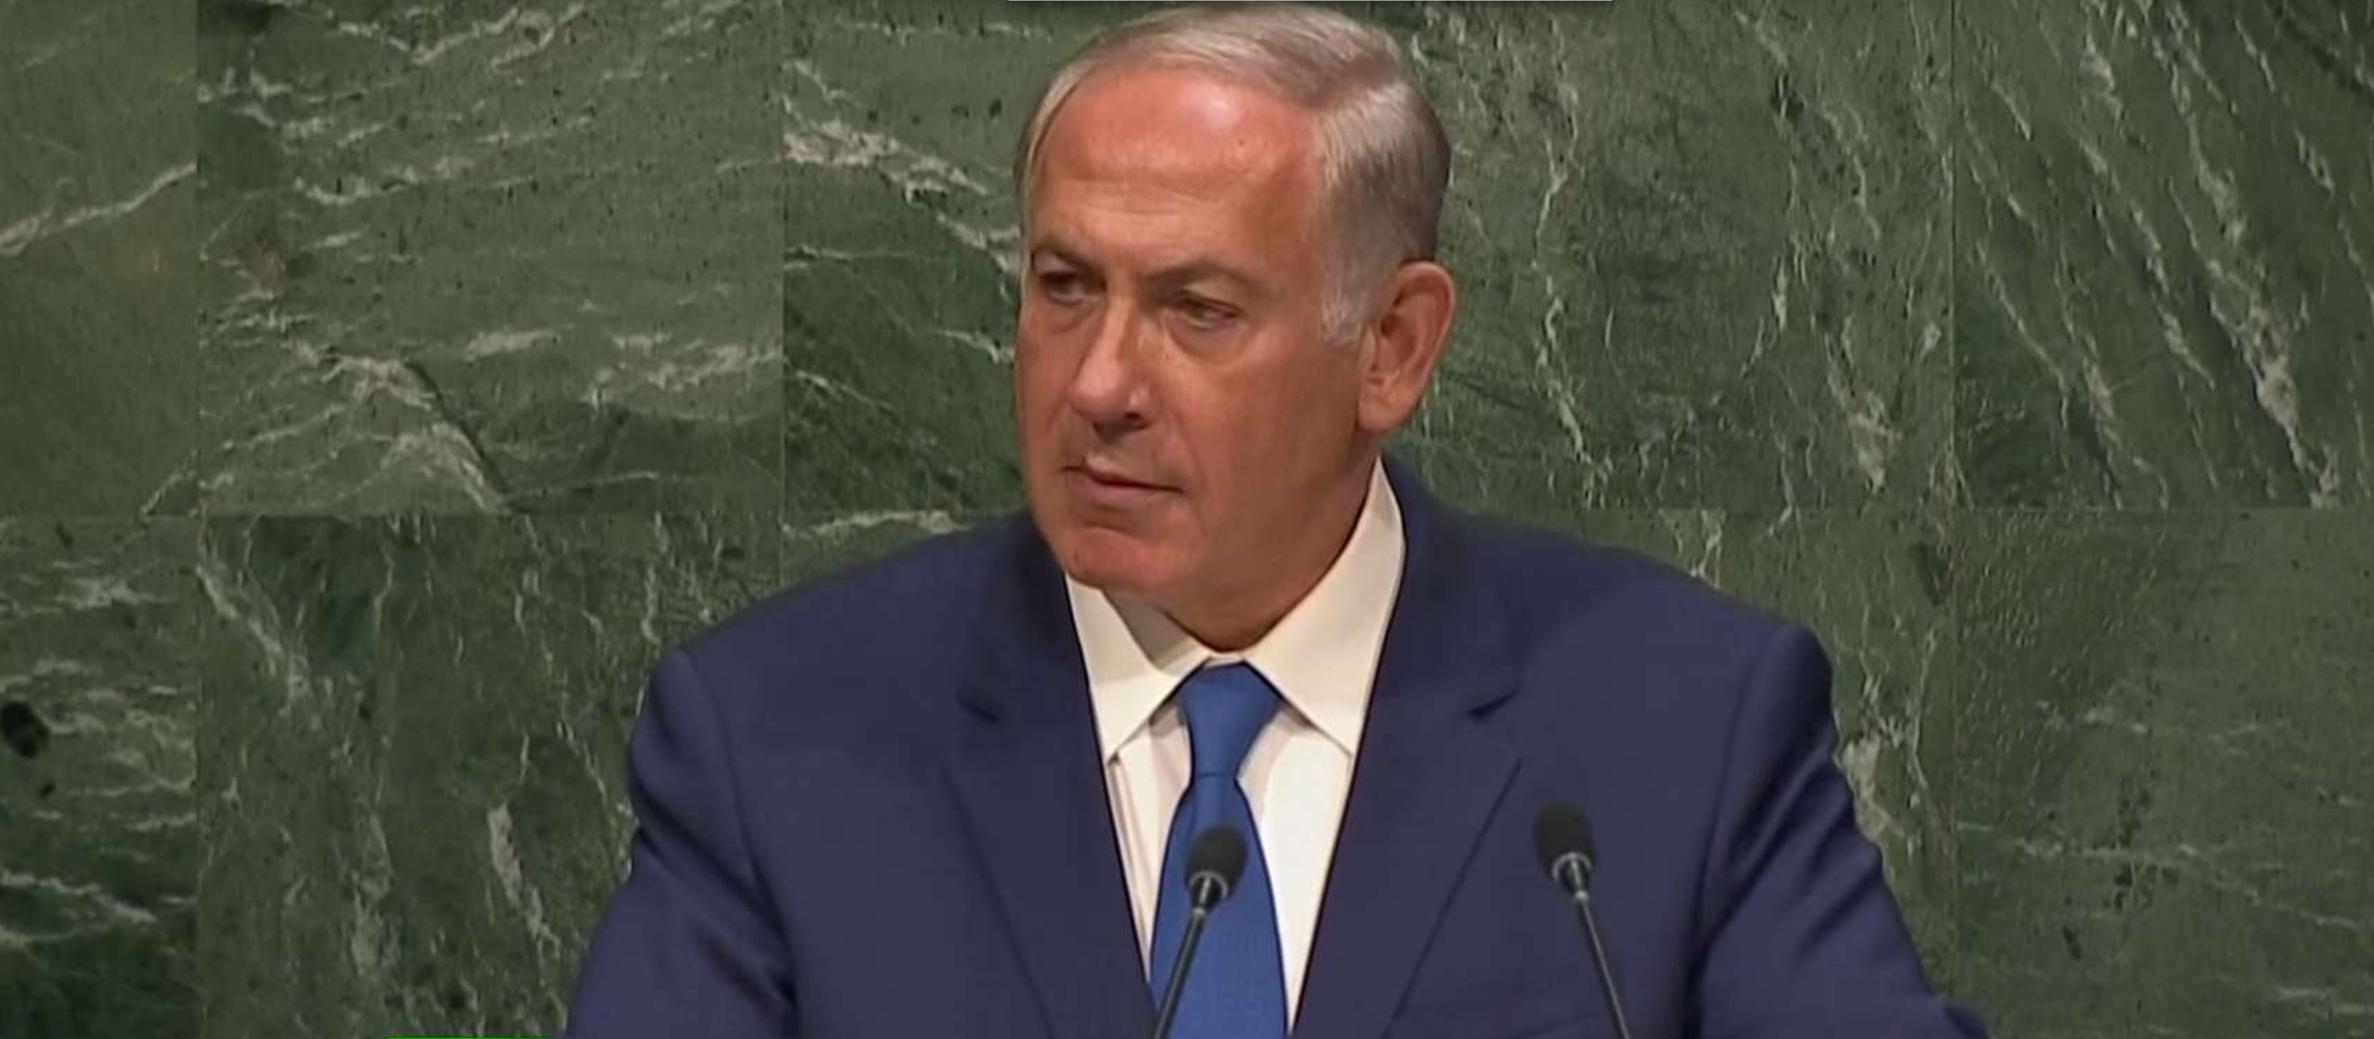 KEY POINTS: PM Netanyahu delivers landmark speech at UN